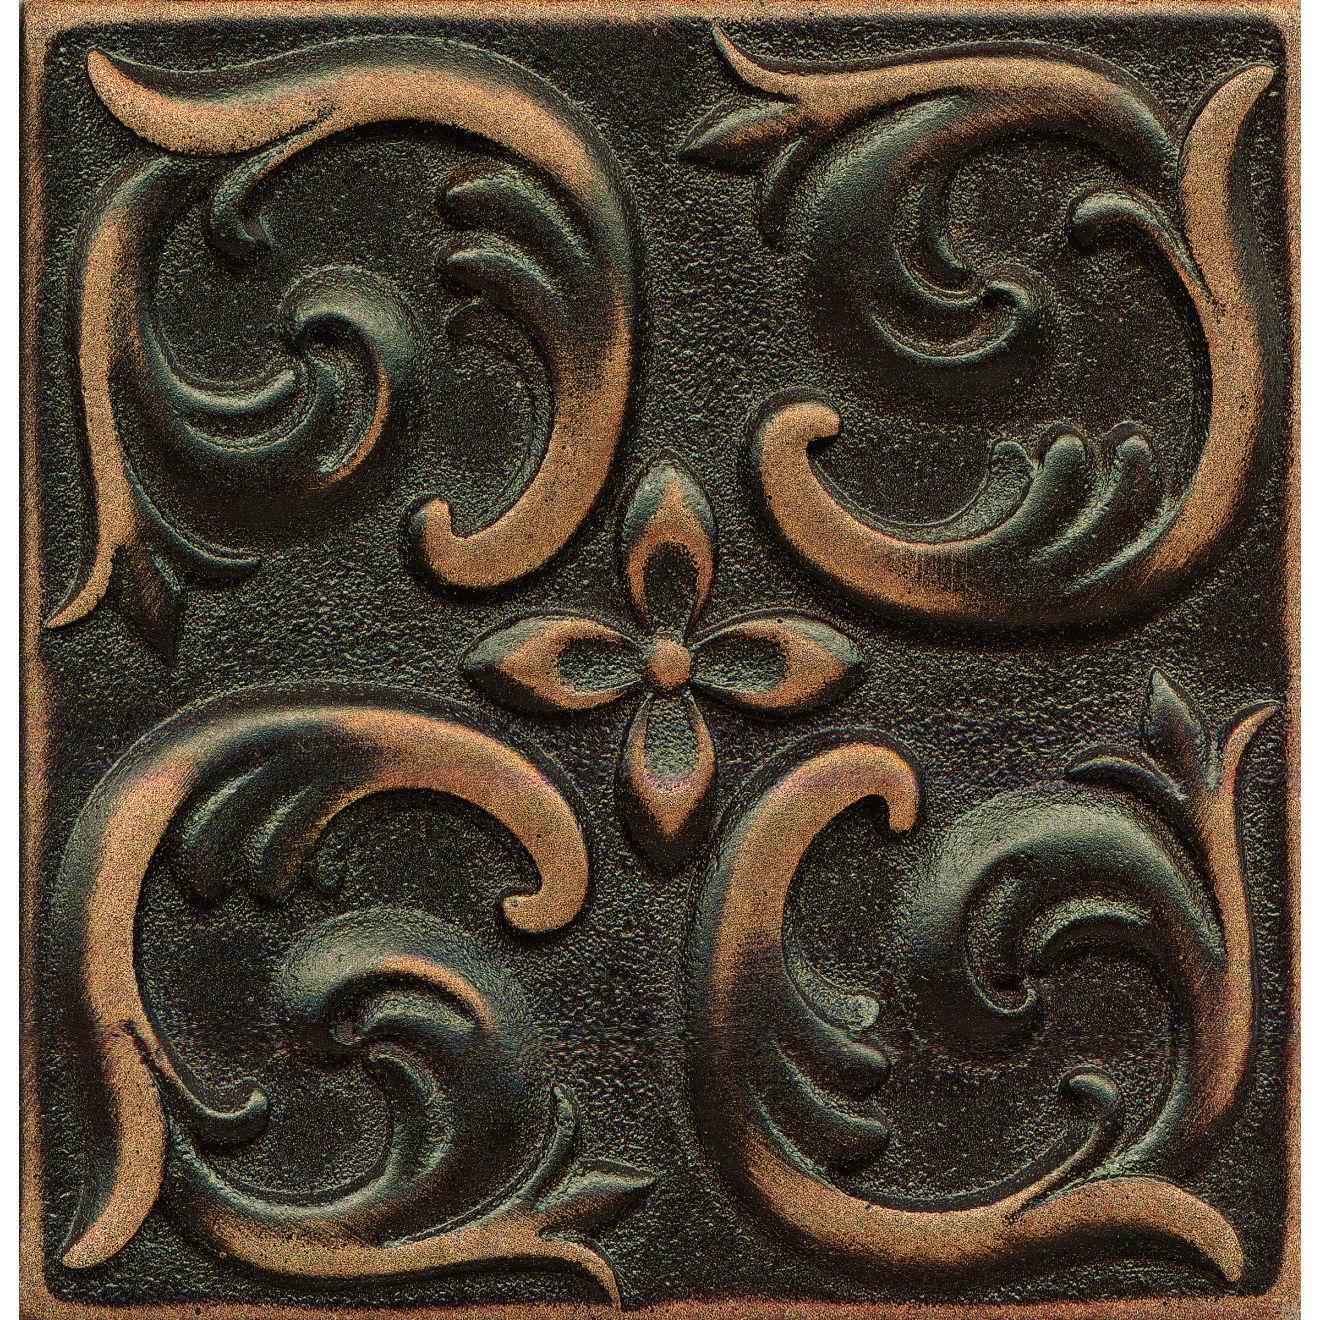 "Ambiance 4"" x 4"" Wave Metal Resin Insert in Venetian Bronze"